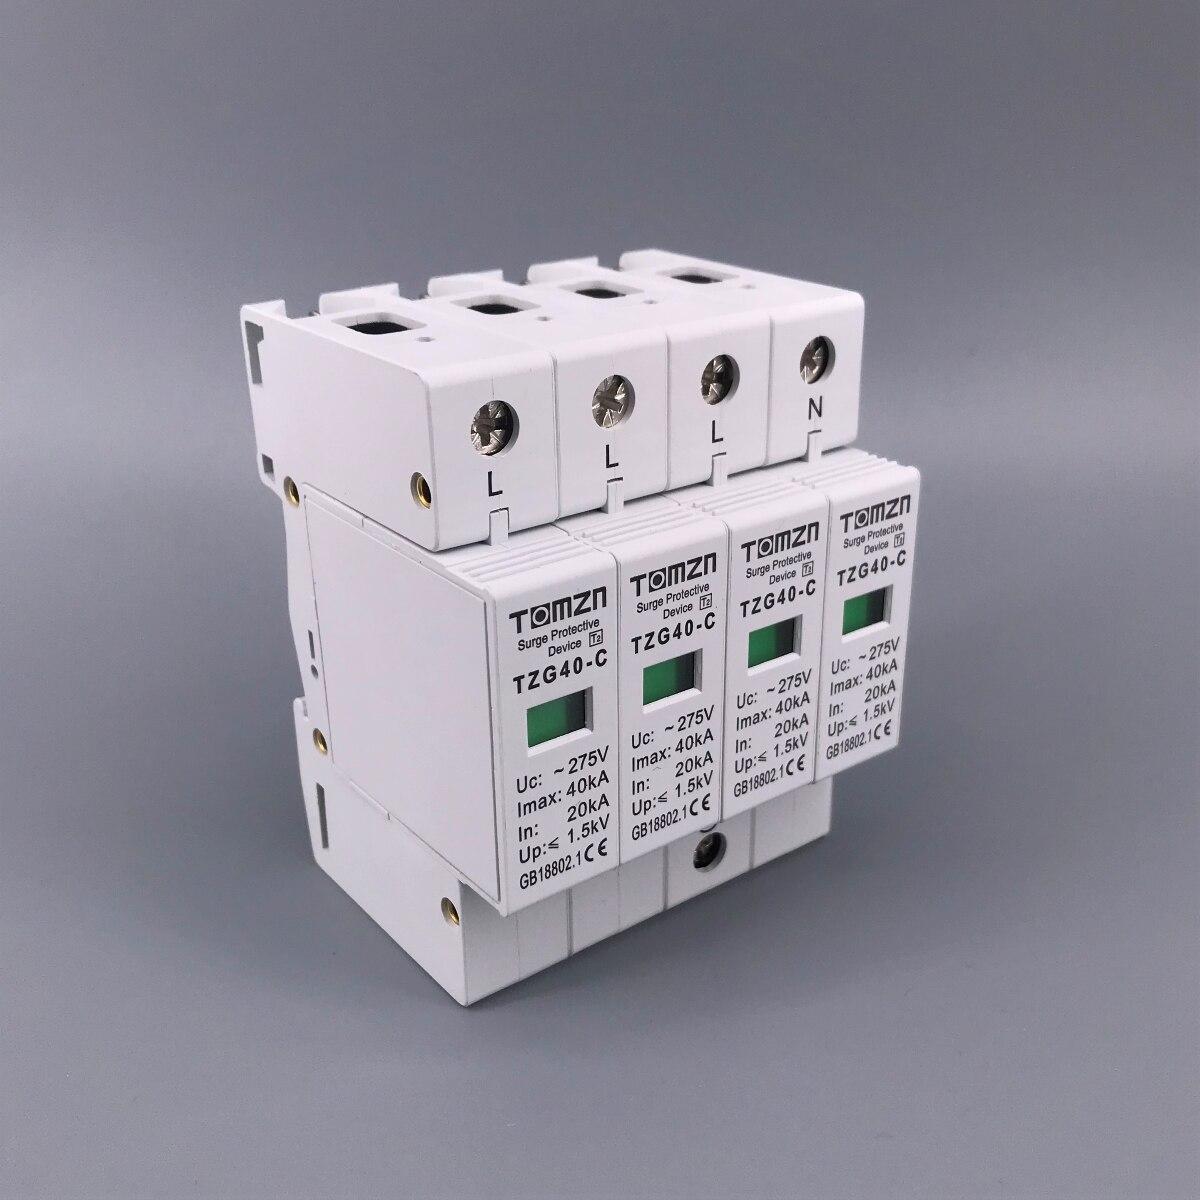 AC SPD 4P 20KA~40KA 275V  House Surge Protector protection Protective Low-voltage  Arrester Device